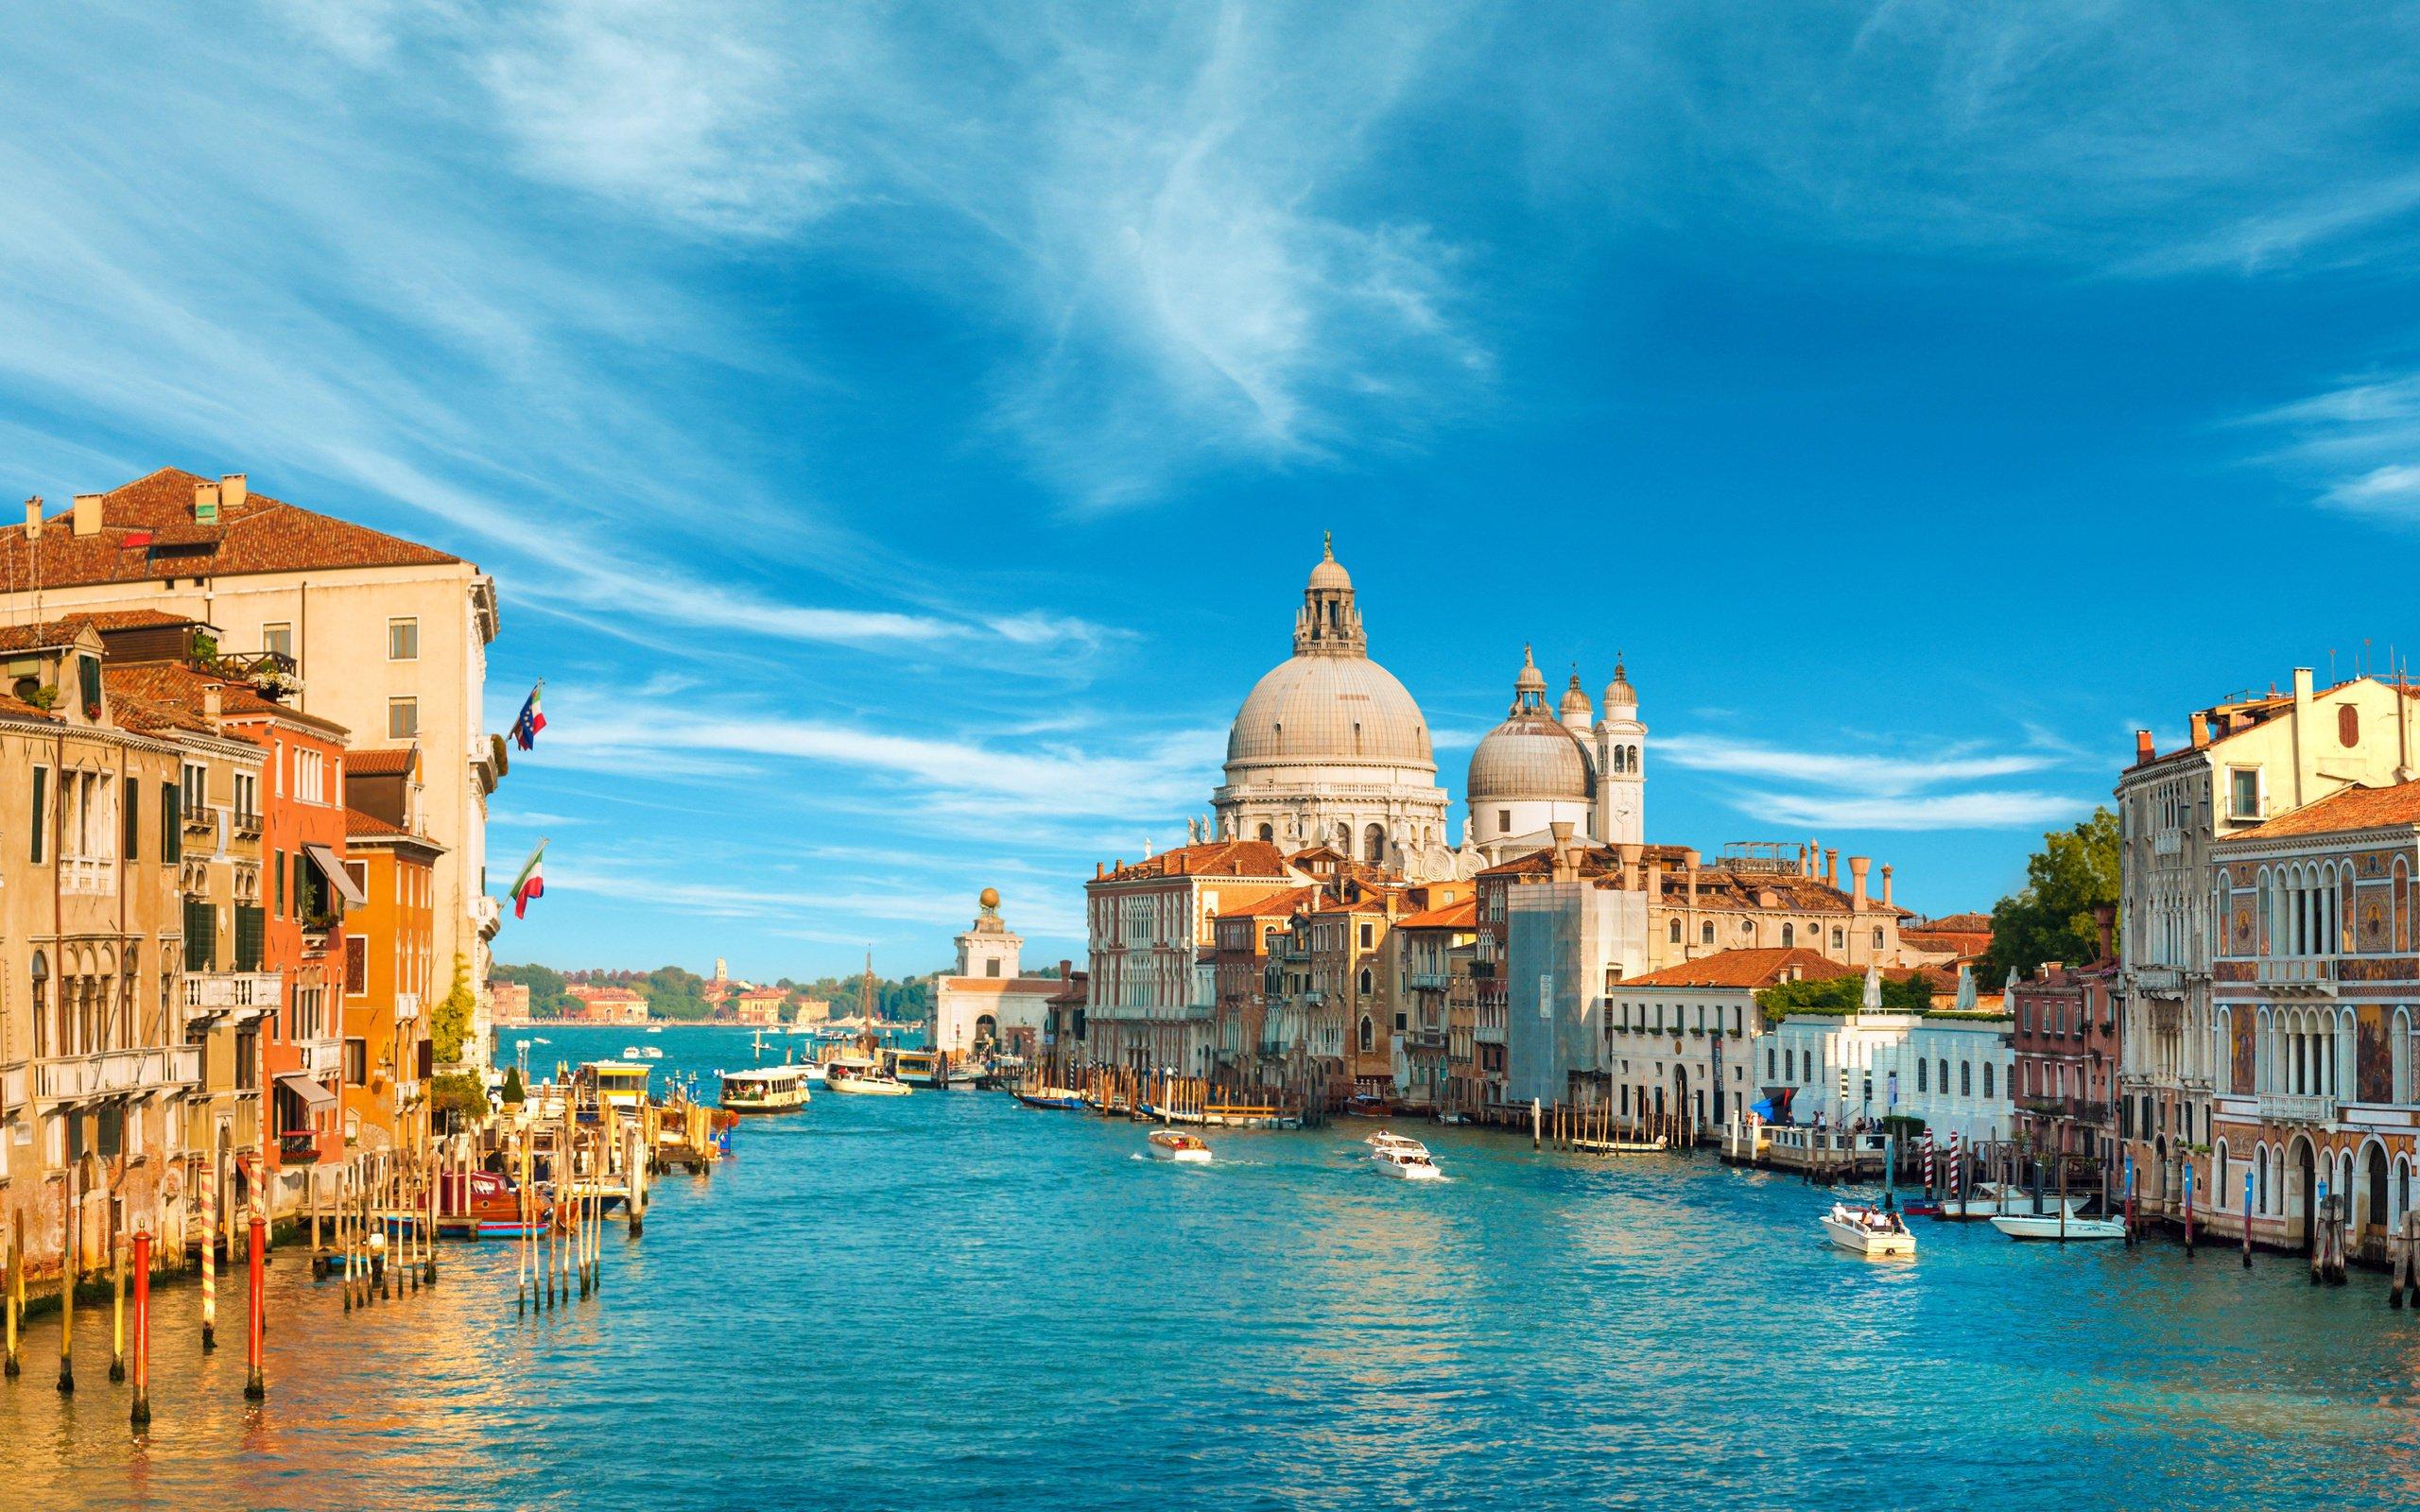 venice italy venezia wallpaper background 2560x1600